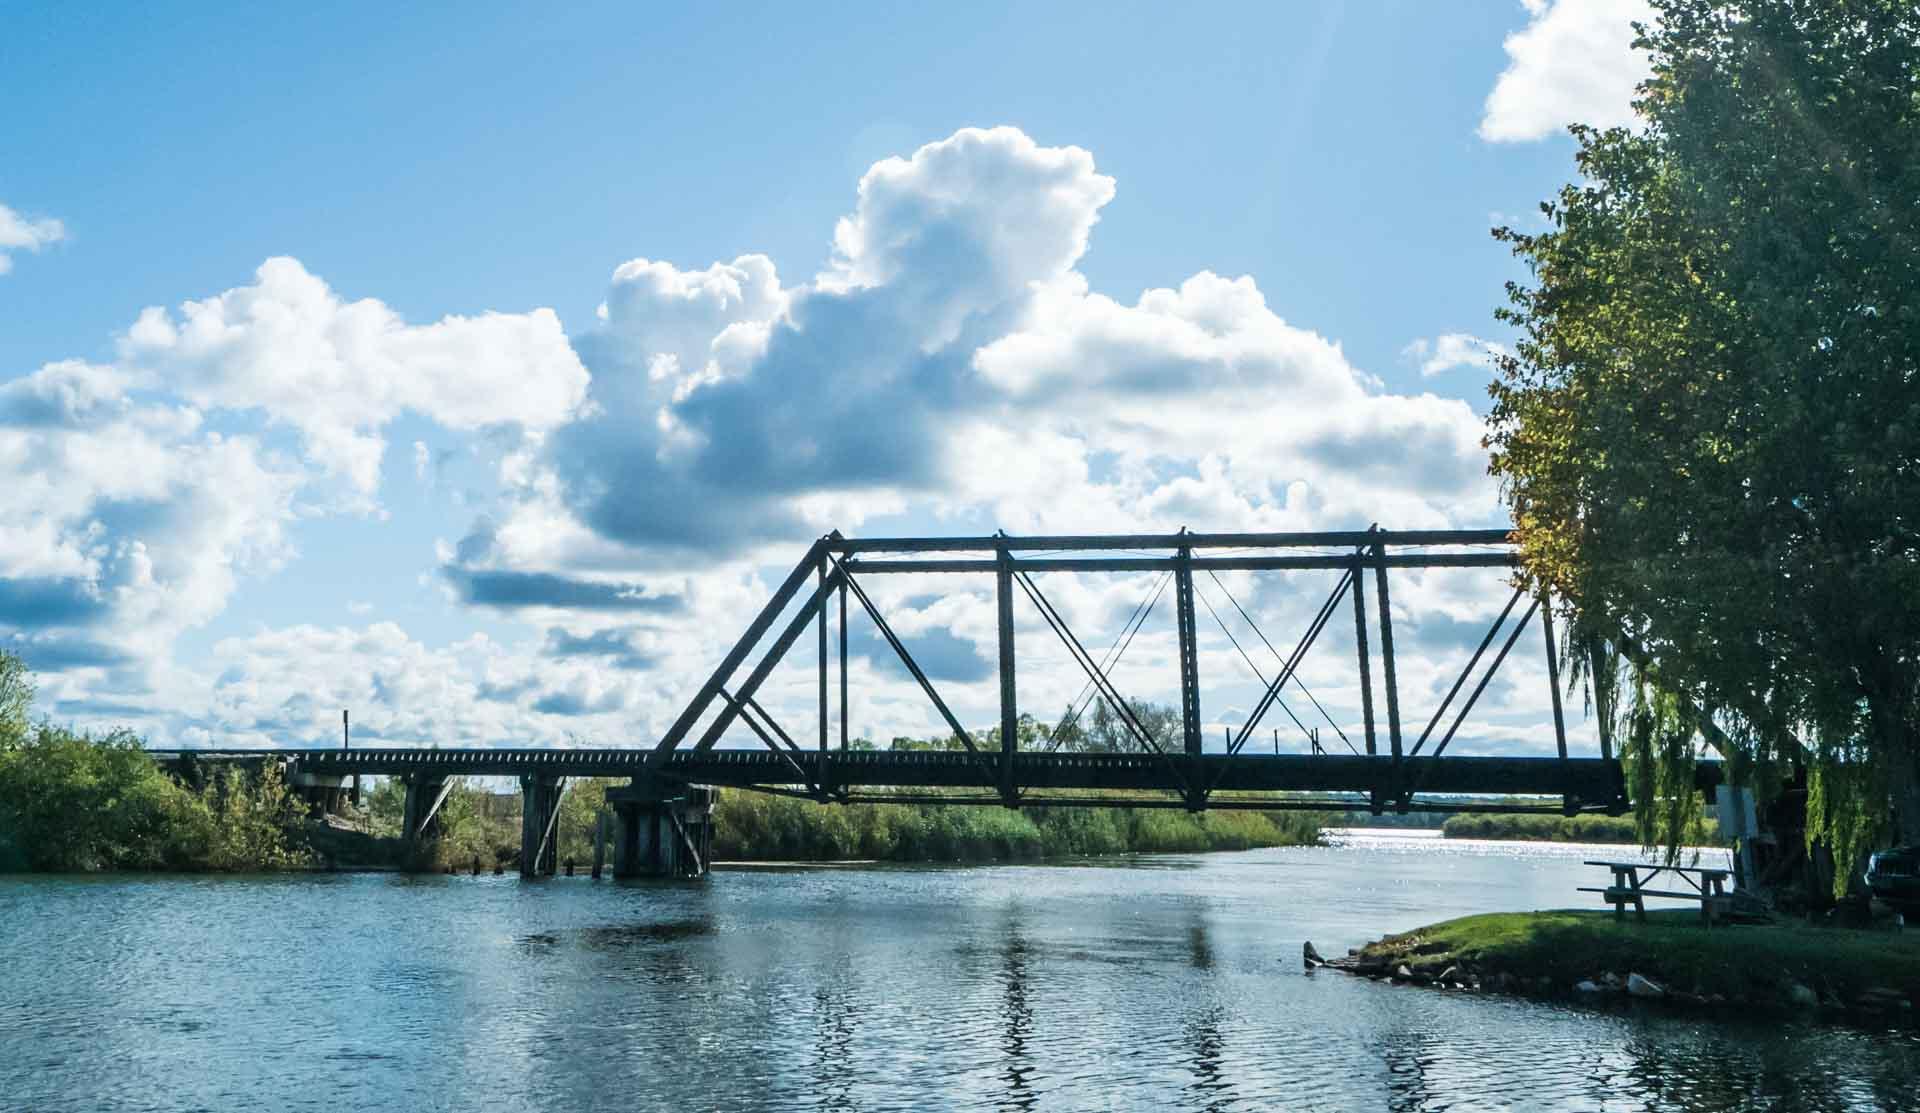 Manistee River Train Bridge